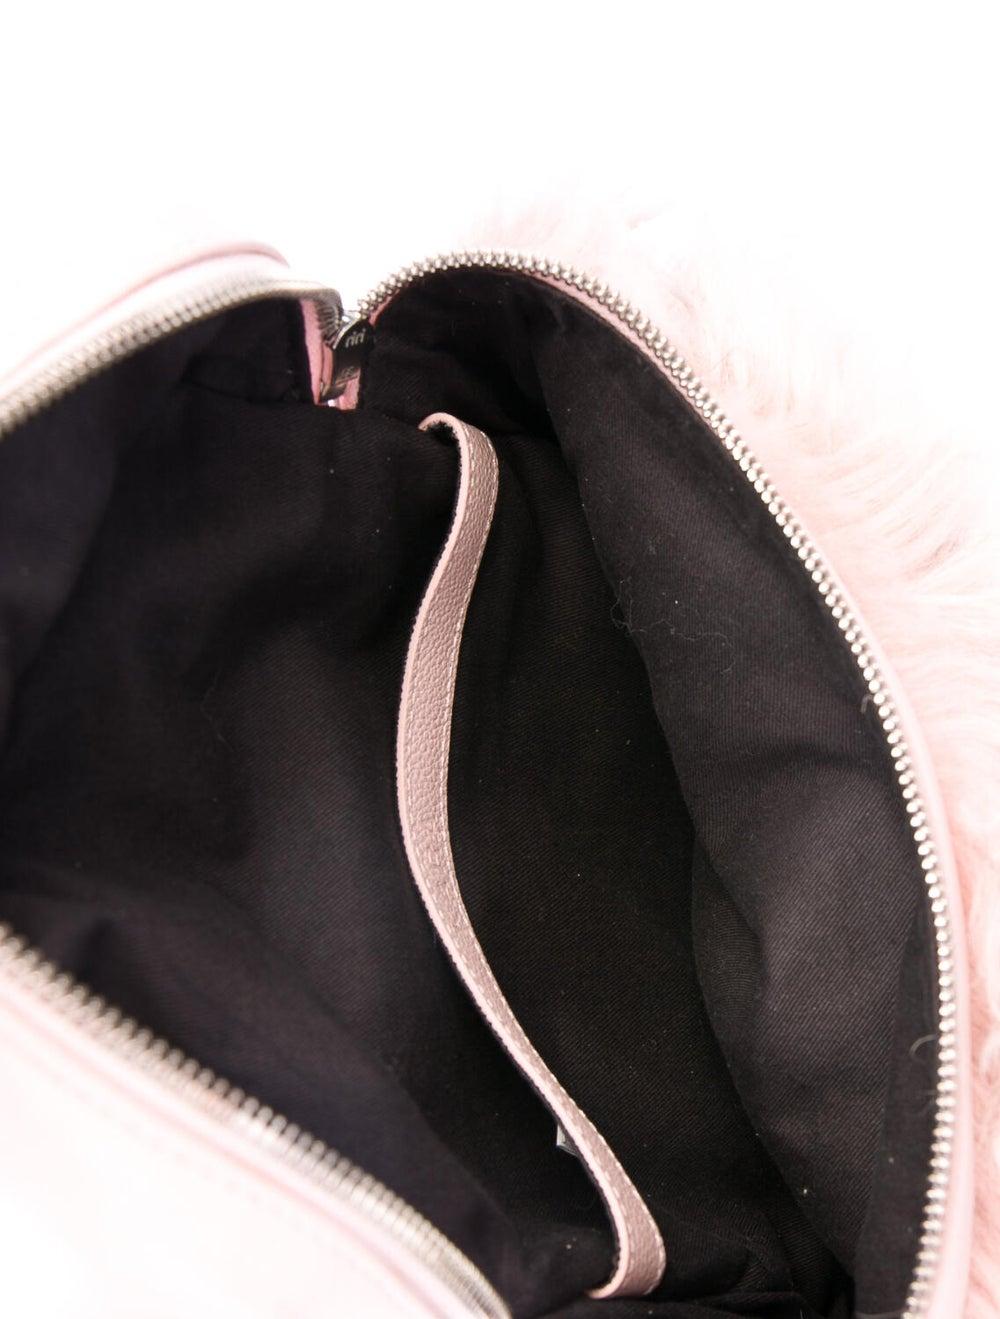 Kara Grained Leather Backpack Pink - image 5